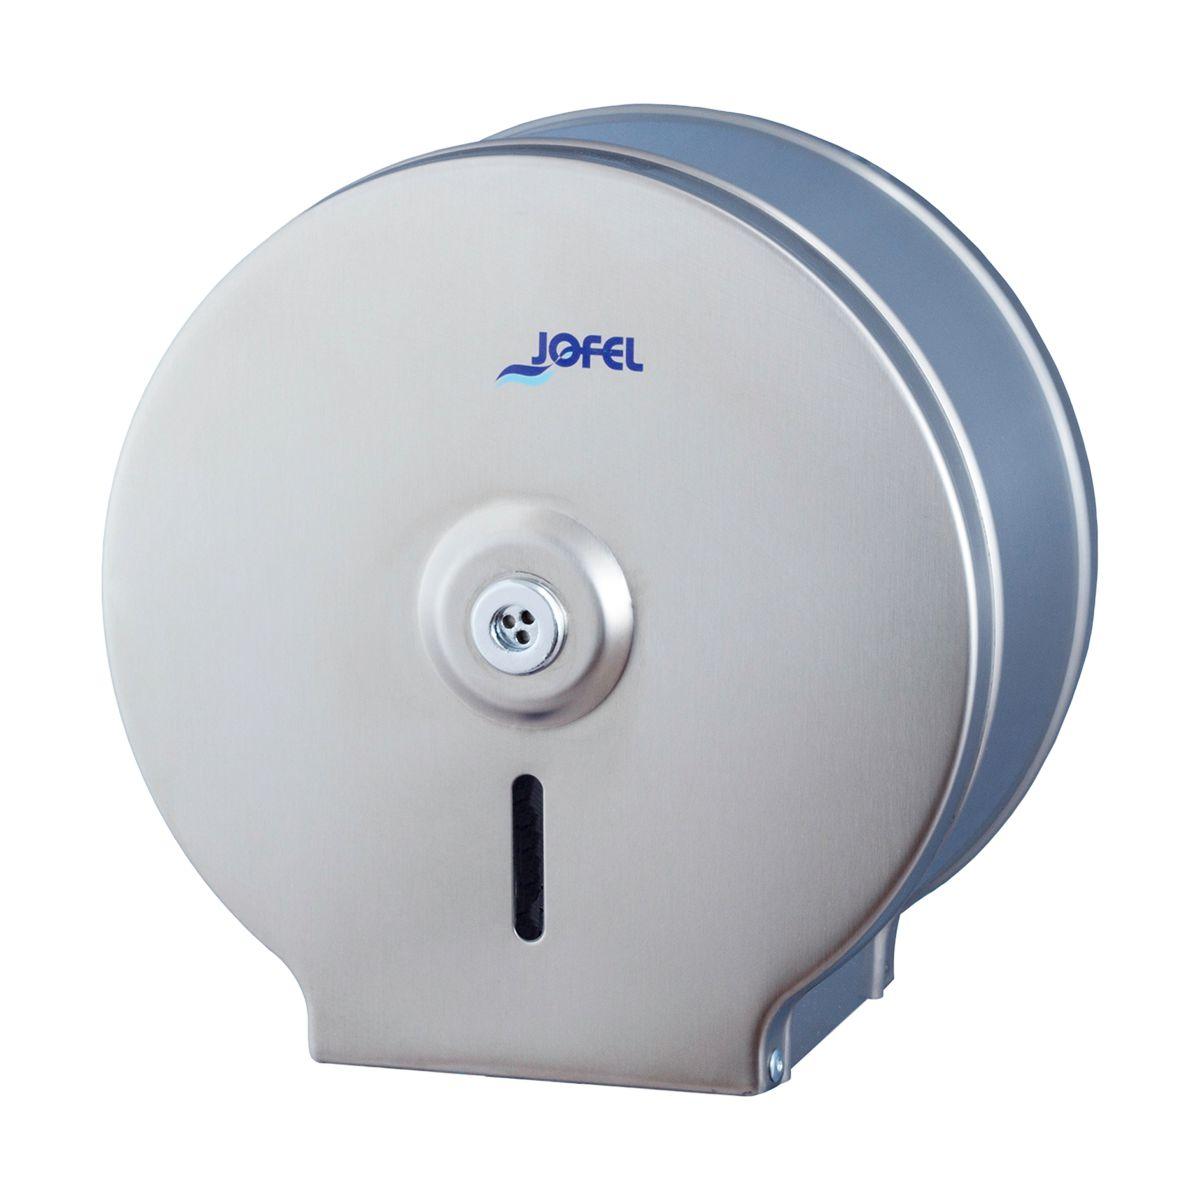 Dispensador de papel higiénico jumbo em aço inox satinado Jofel